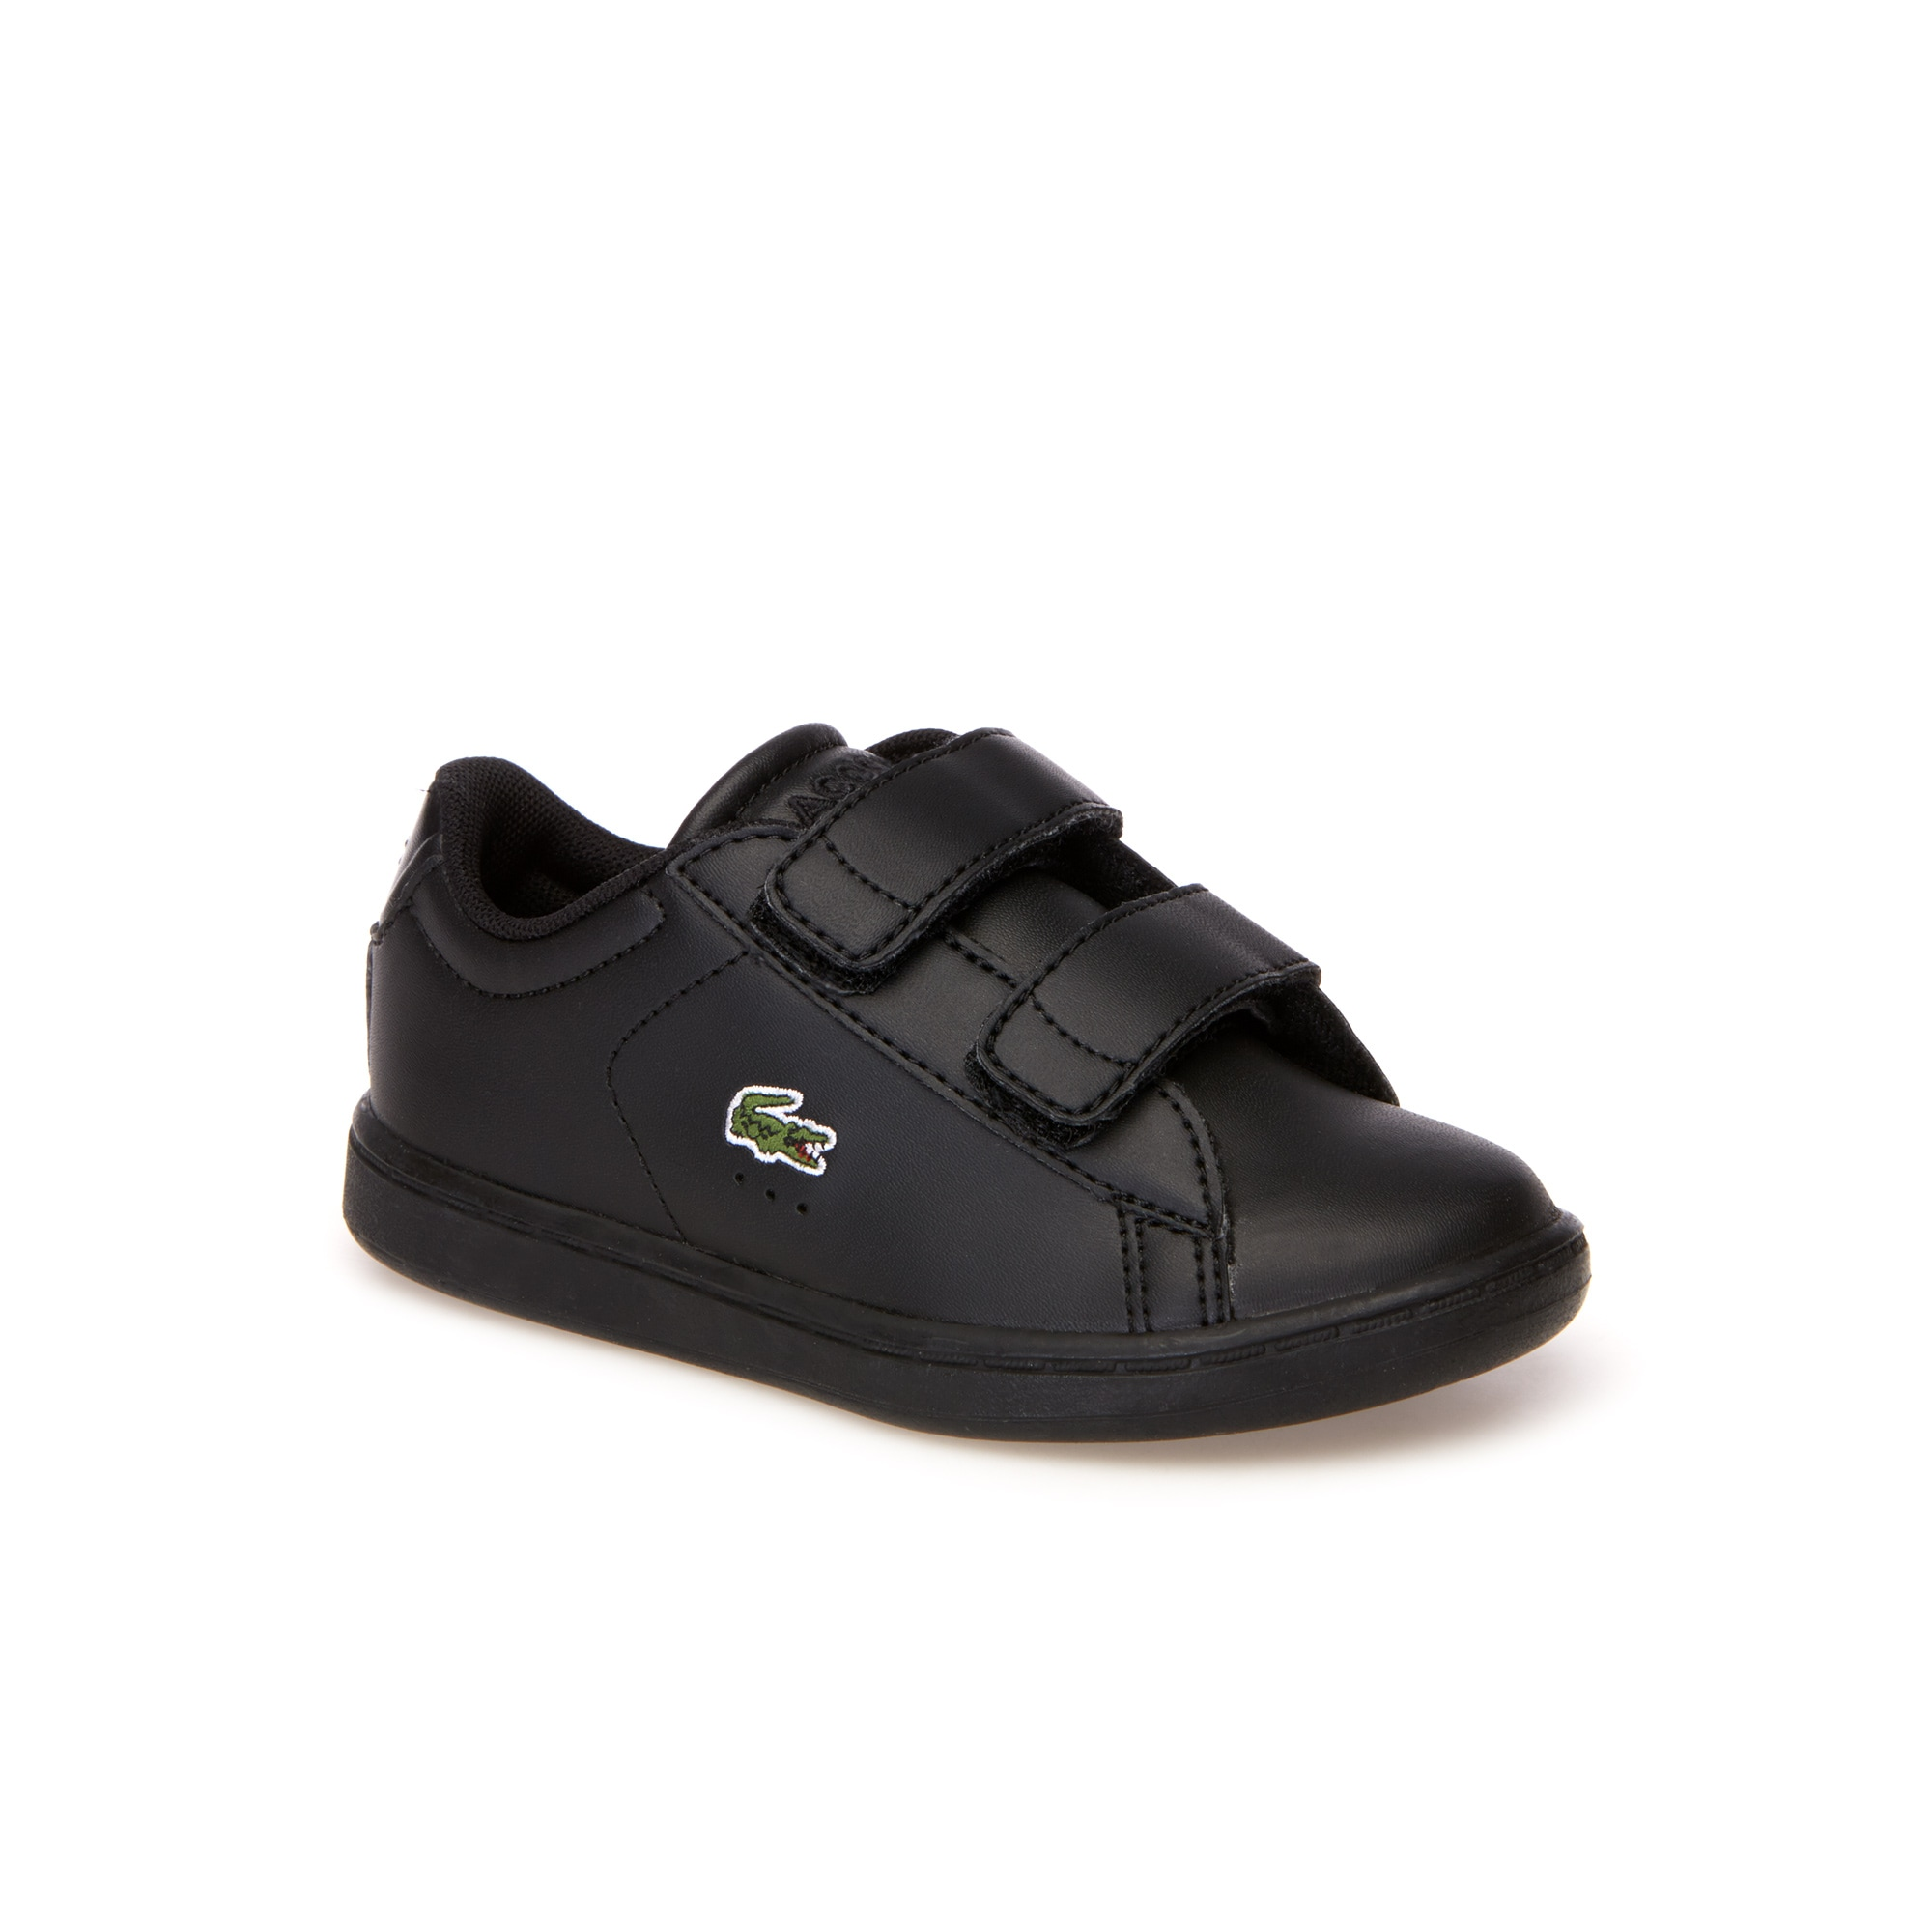 Sneakers Enfant Carnaby Evo en simili-cuir avec semelle intérieure OrthoLite